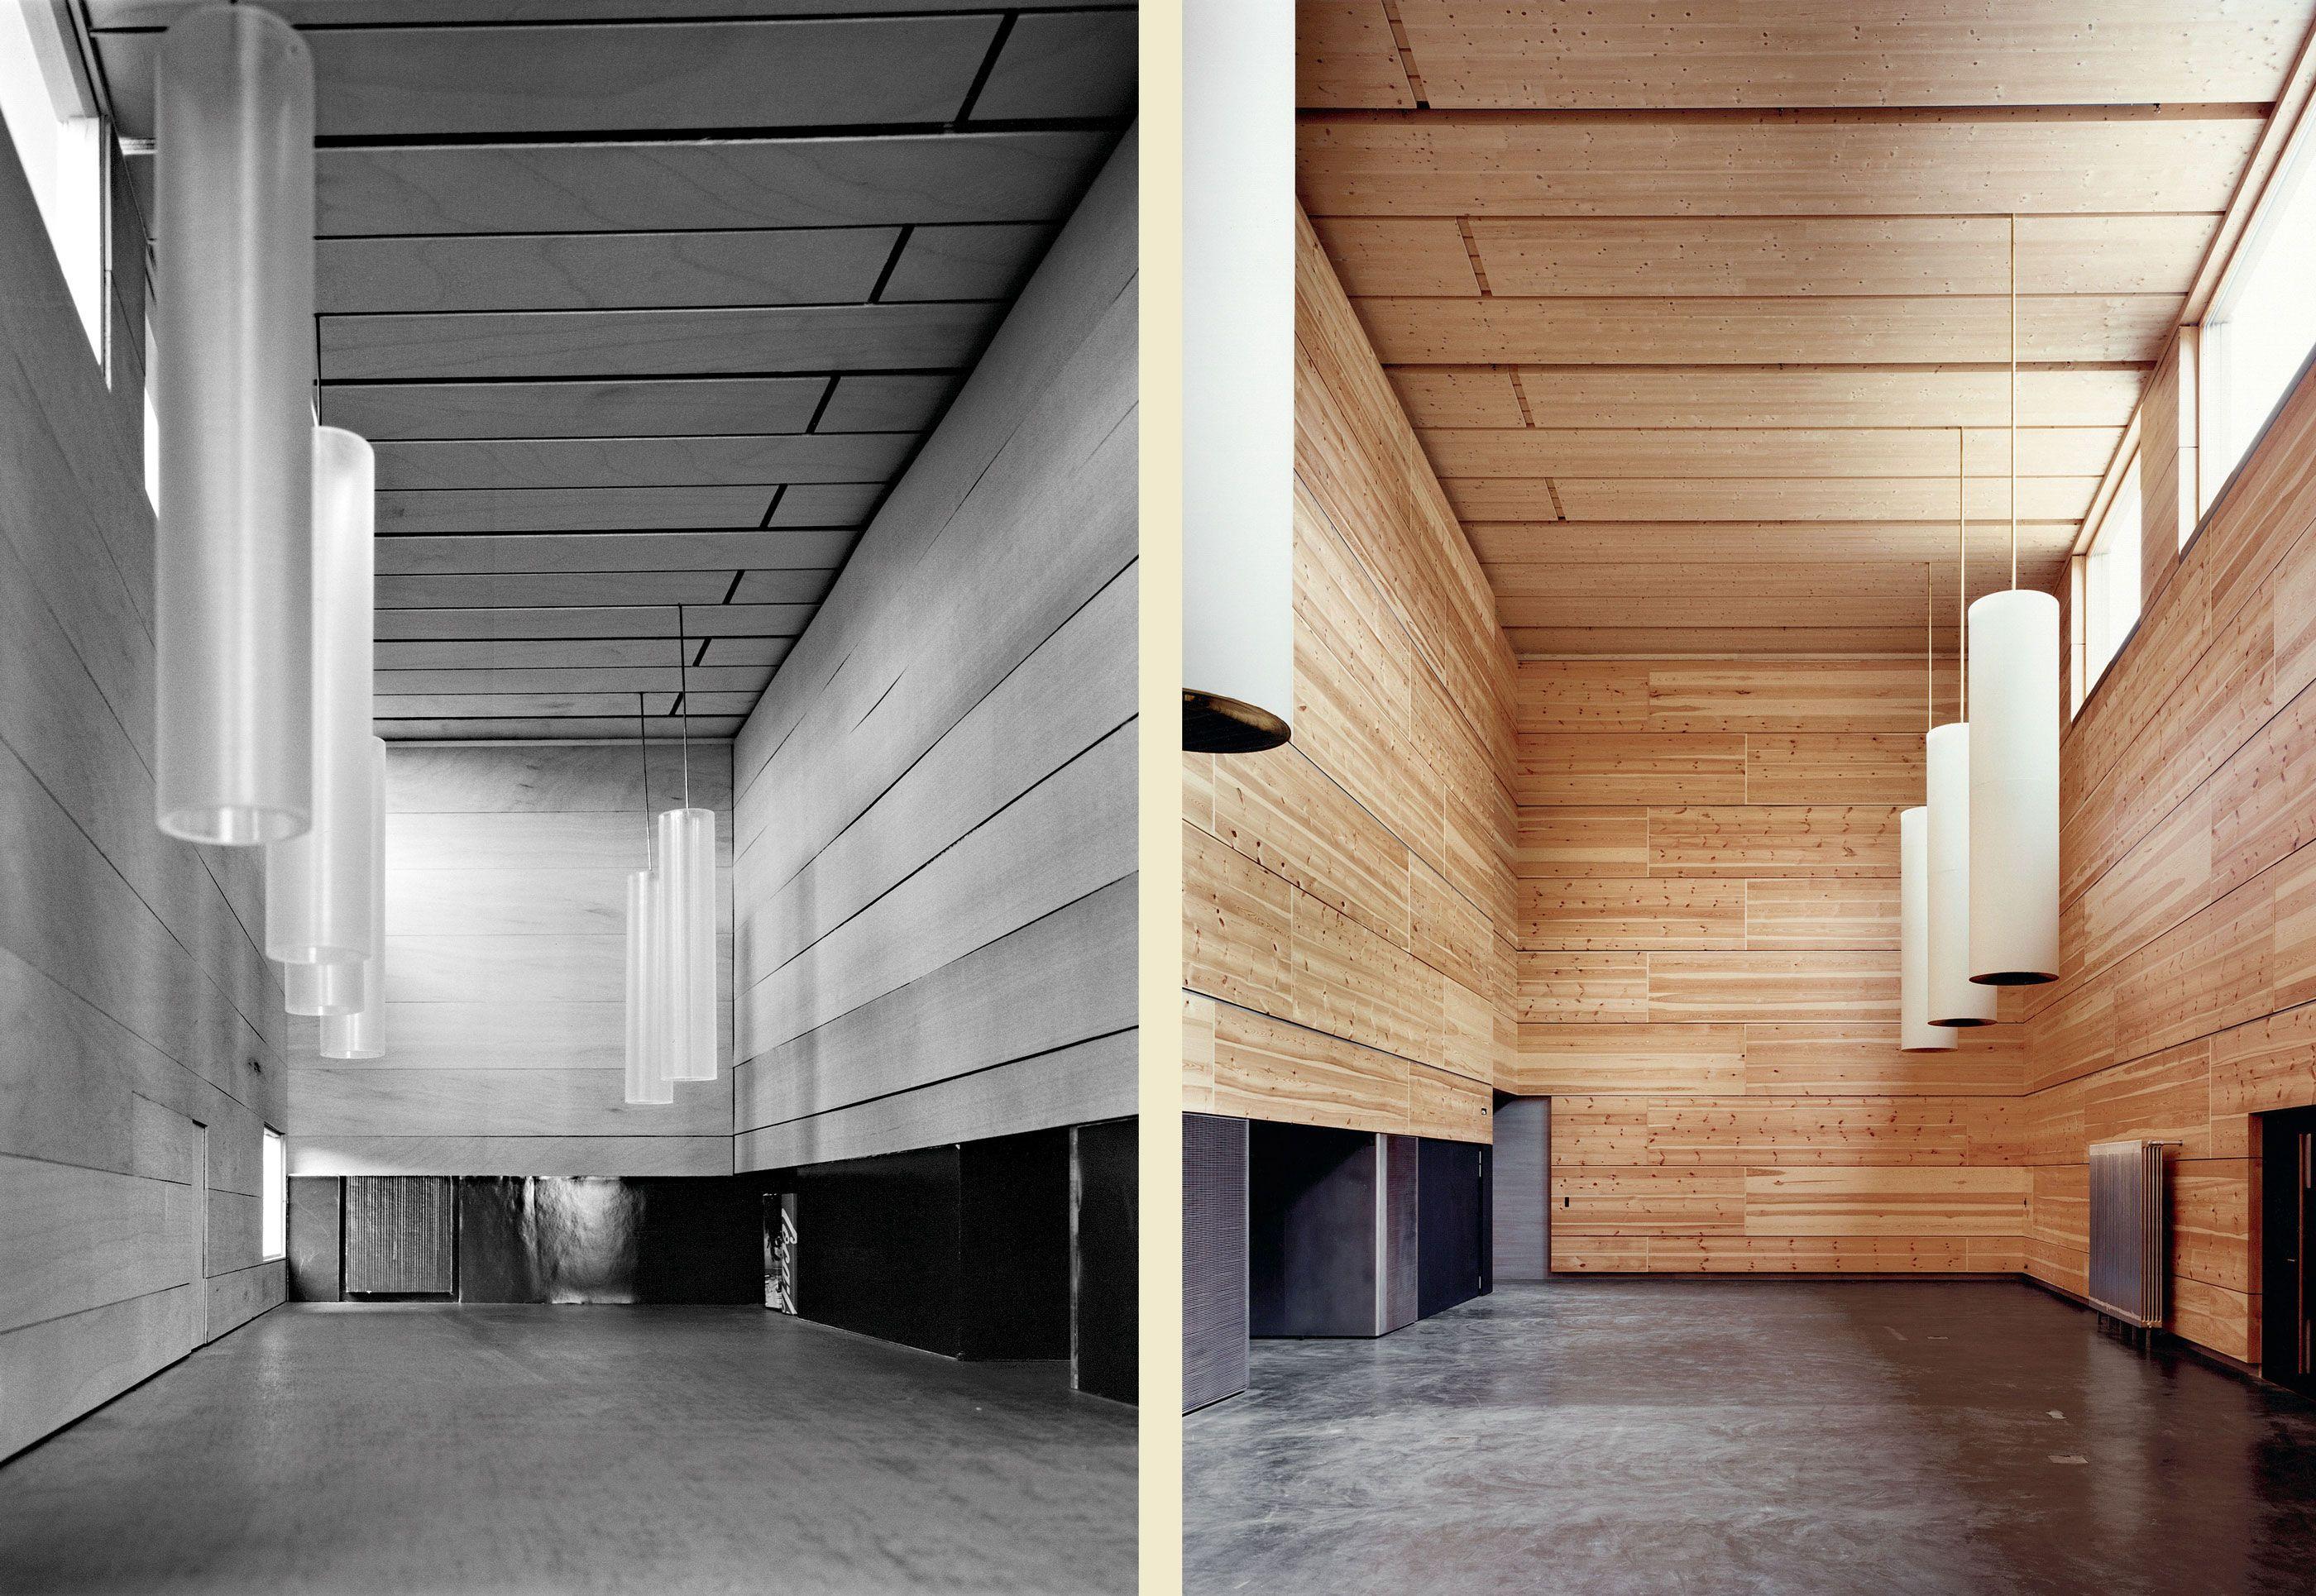 Foyer Art Vif Bienne : Swiss school of engineering for the wood industry bienne